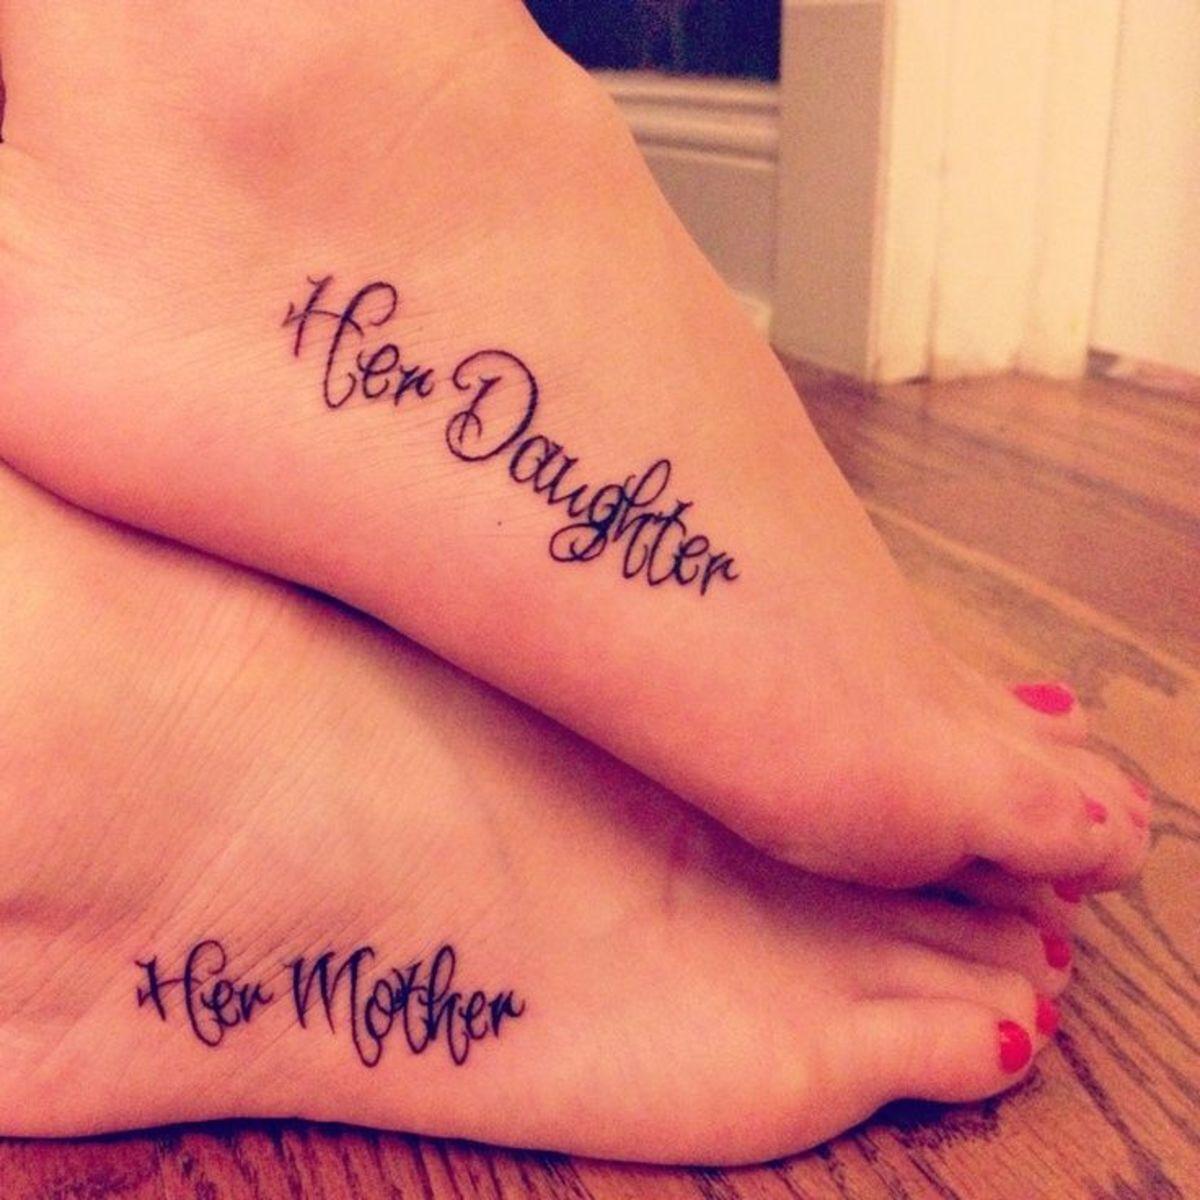 tattooed-parents-with-tattooed-kids